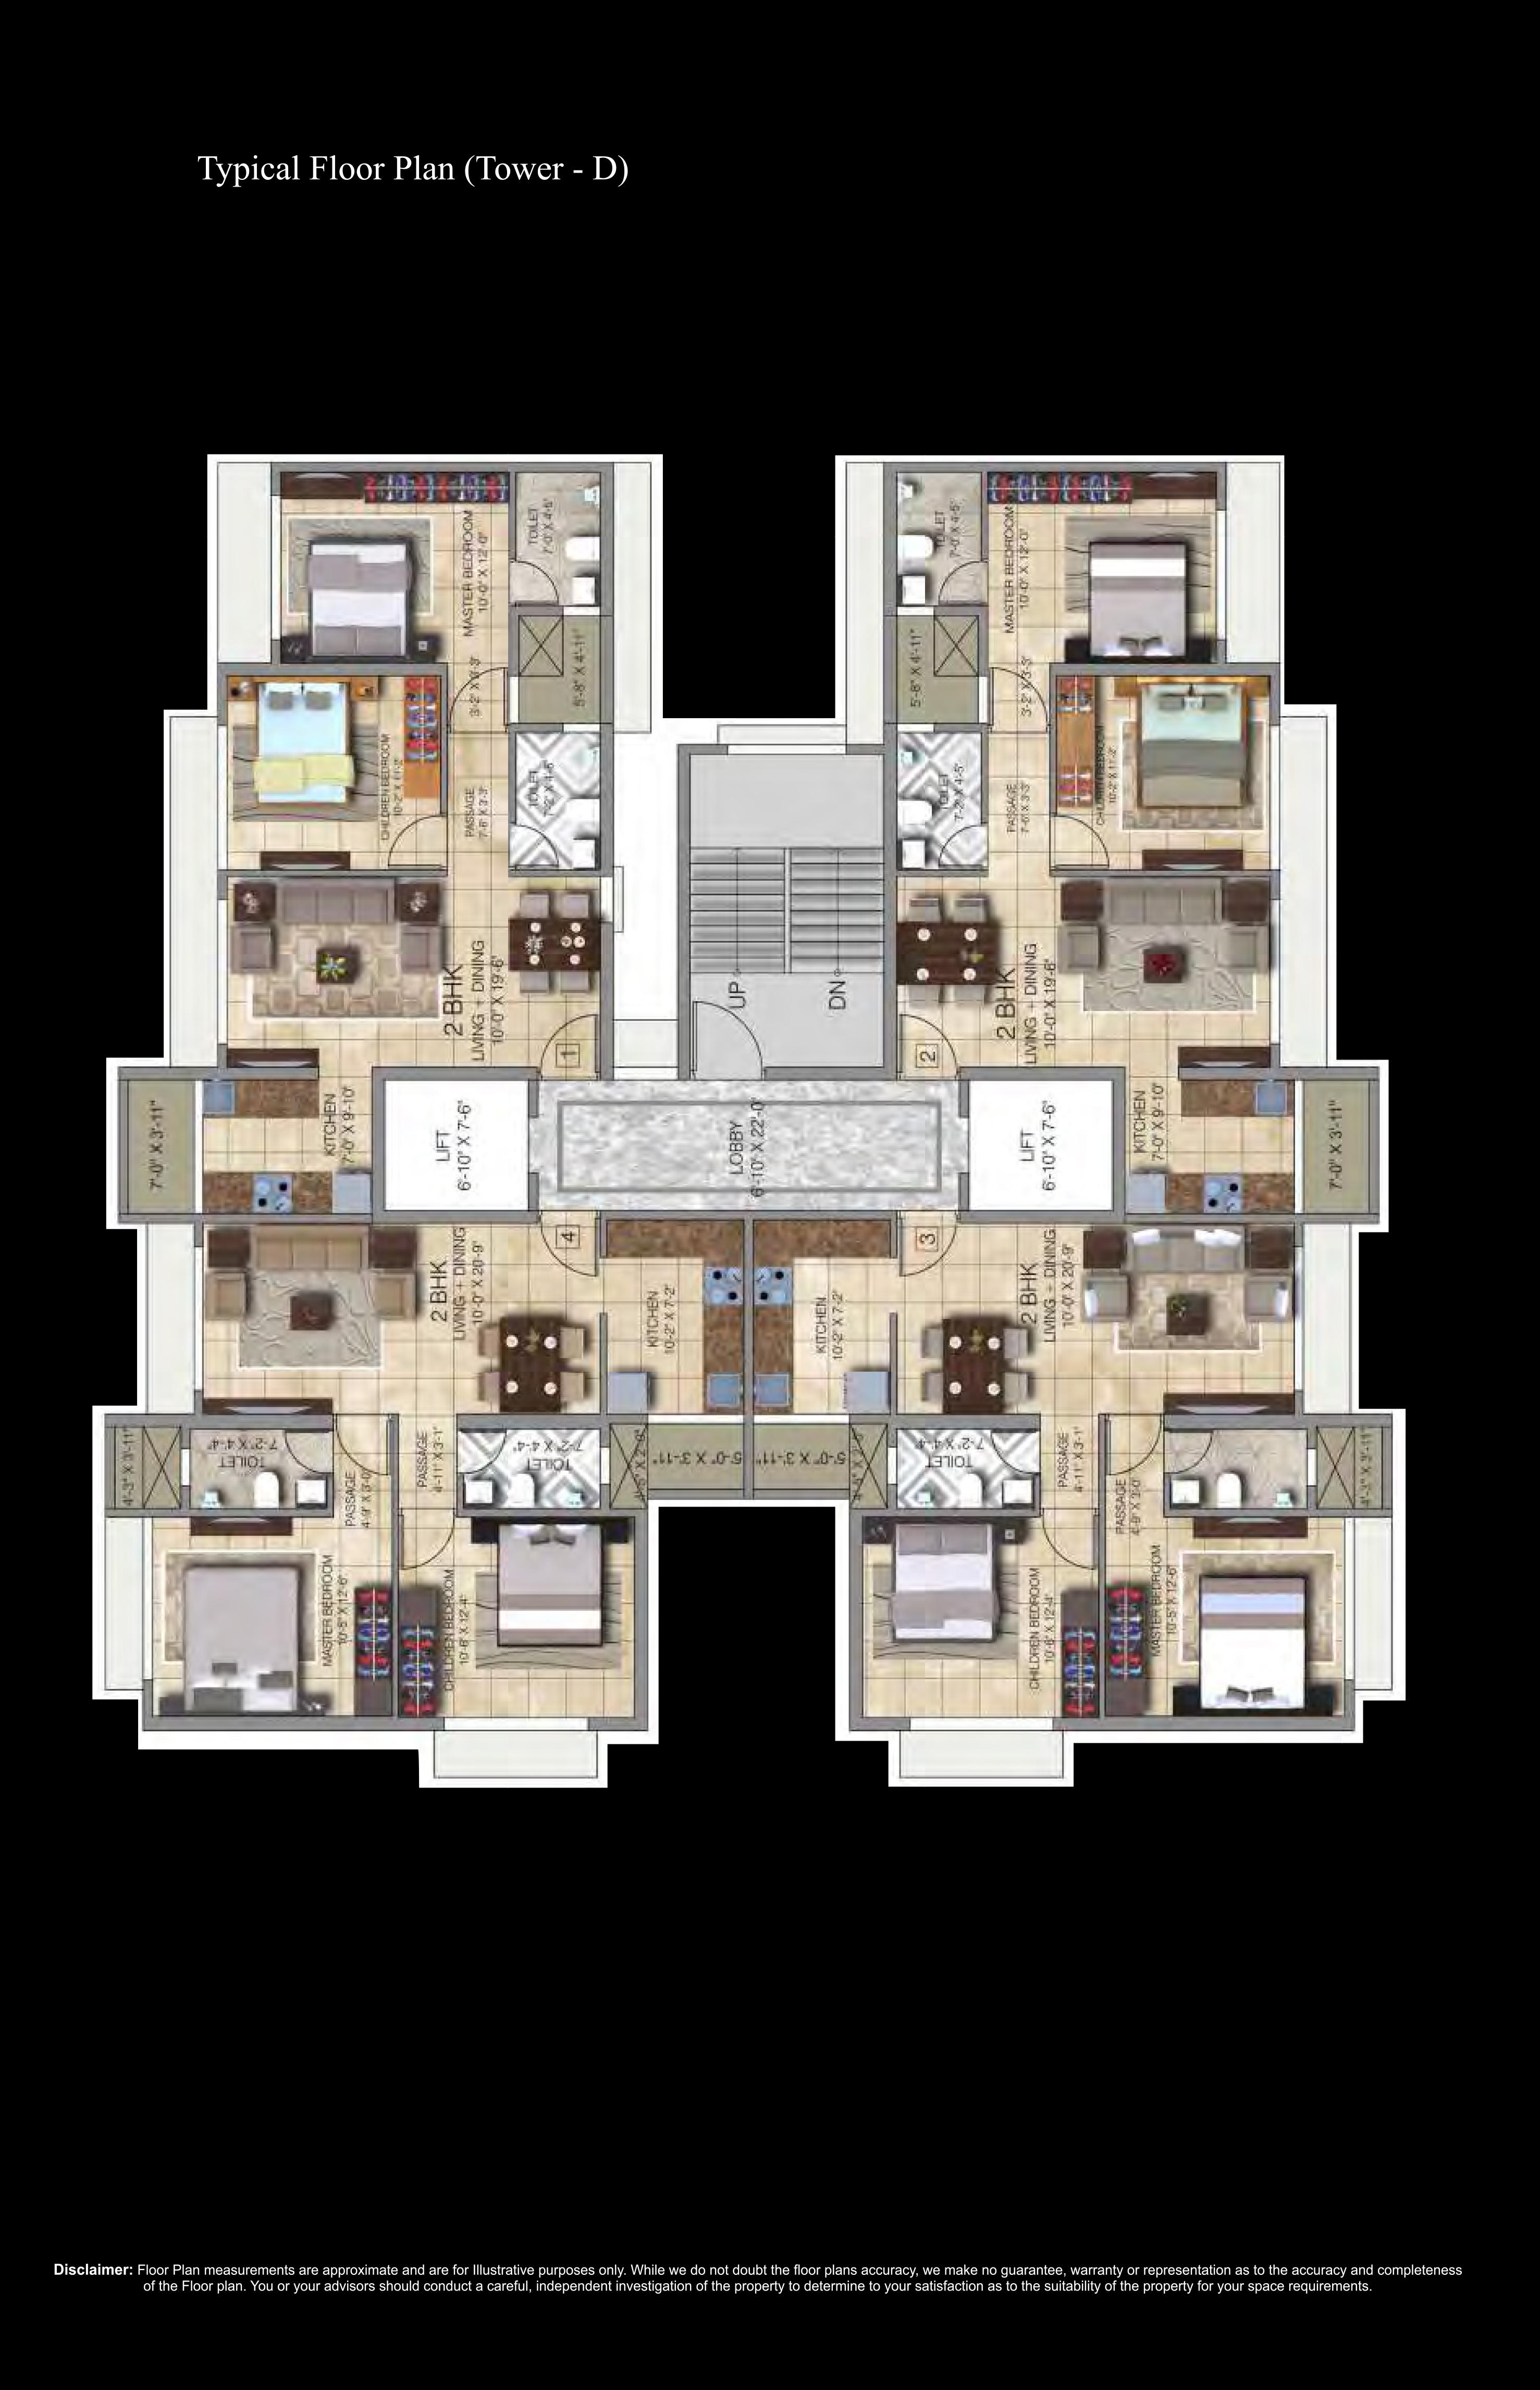 2 Bedroom Spacious Apartments At The Splendid Ananda Residency By Paradigm Dotom Realty Borivali Ishwar Estate Consultant